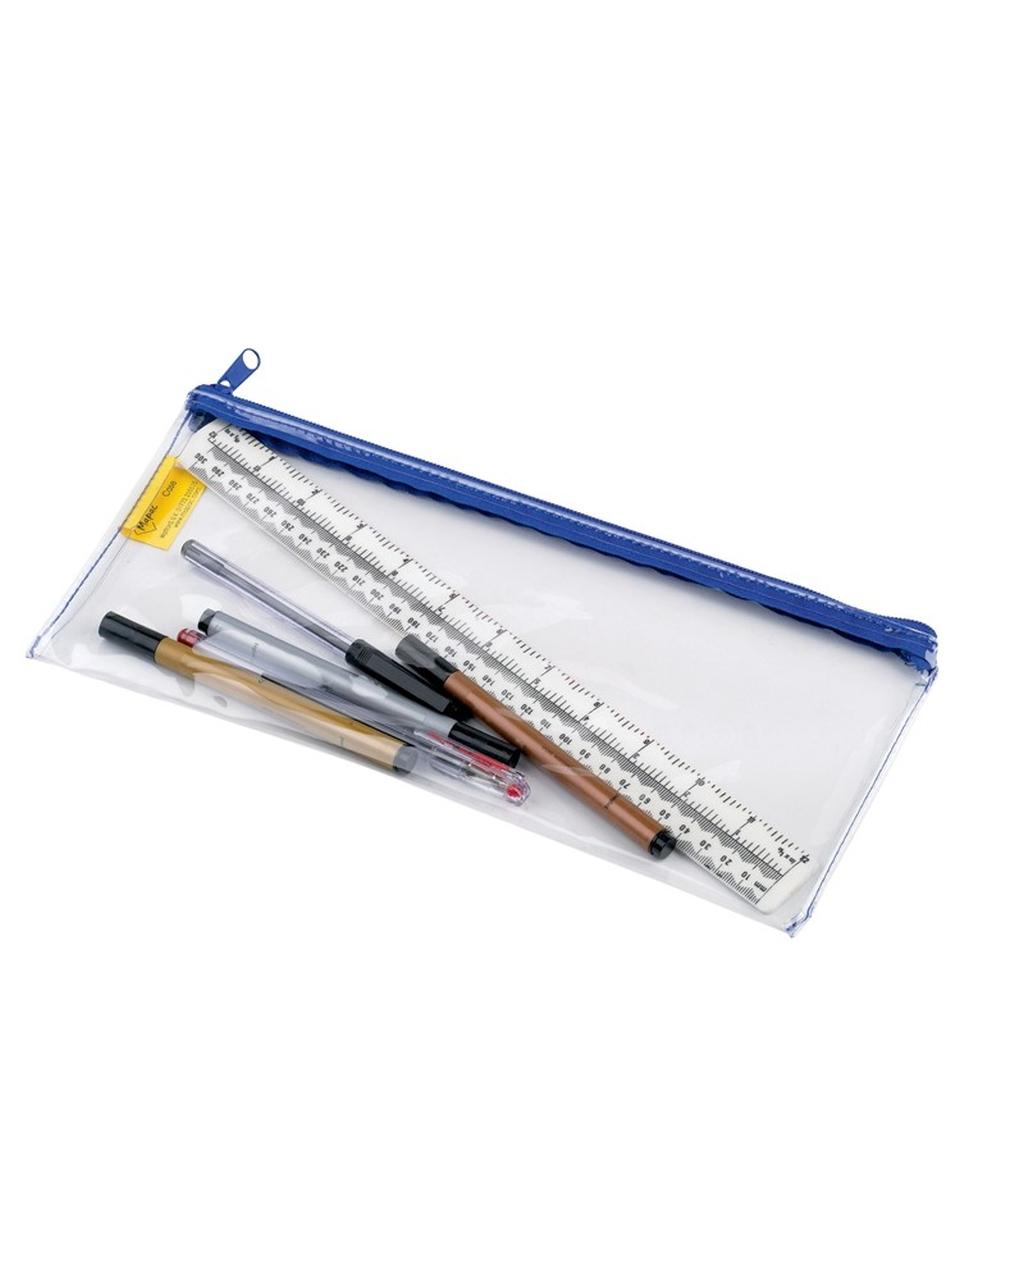 Clear Pencil Case 33 x 12.5cm